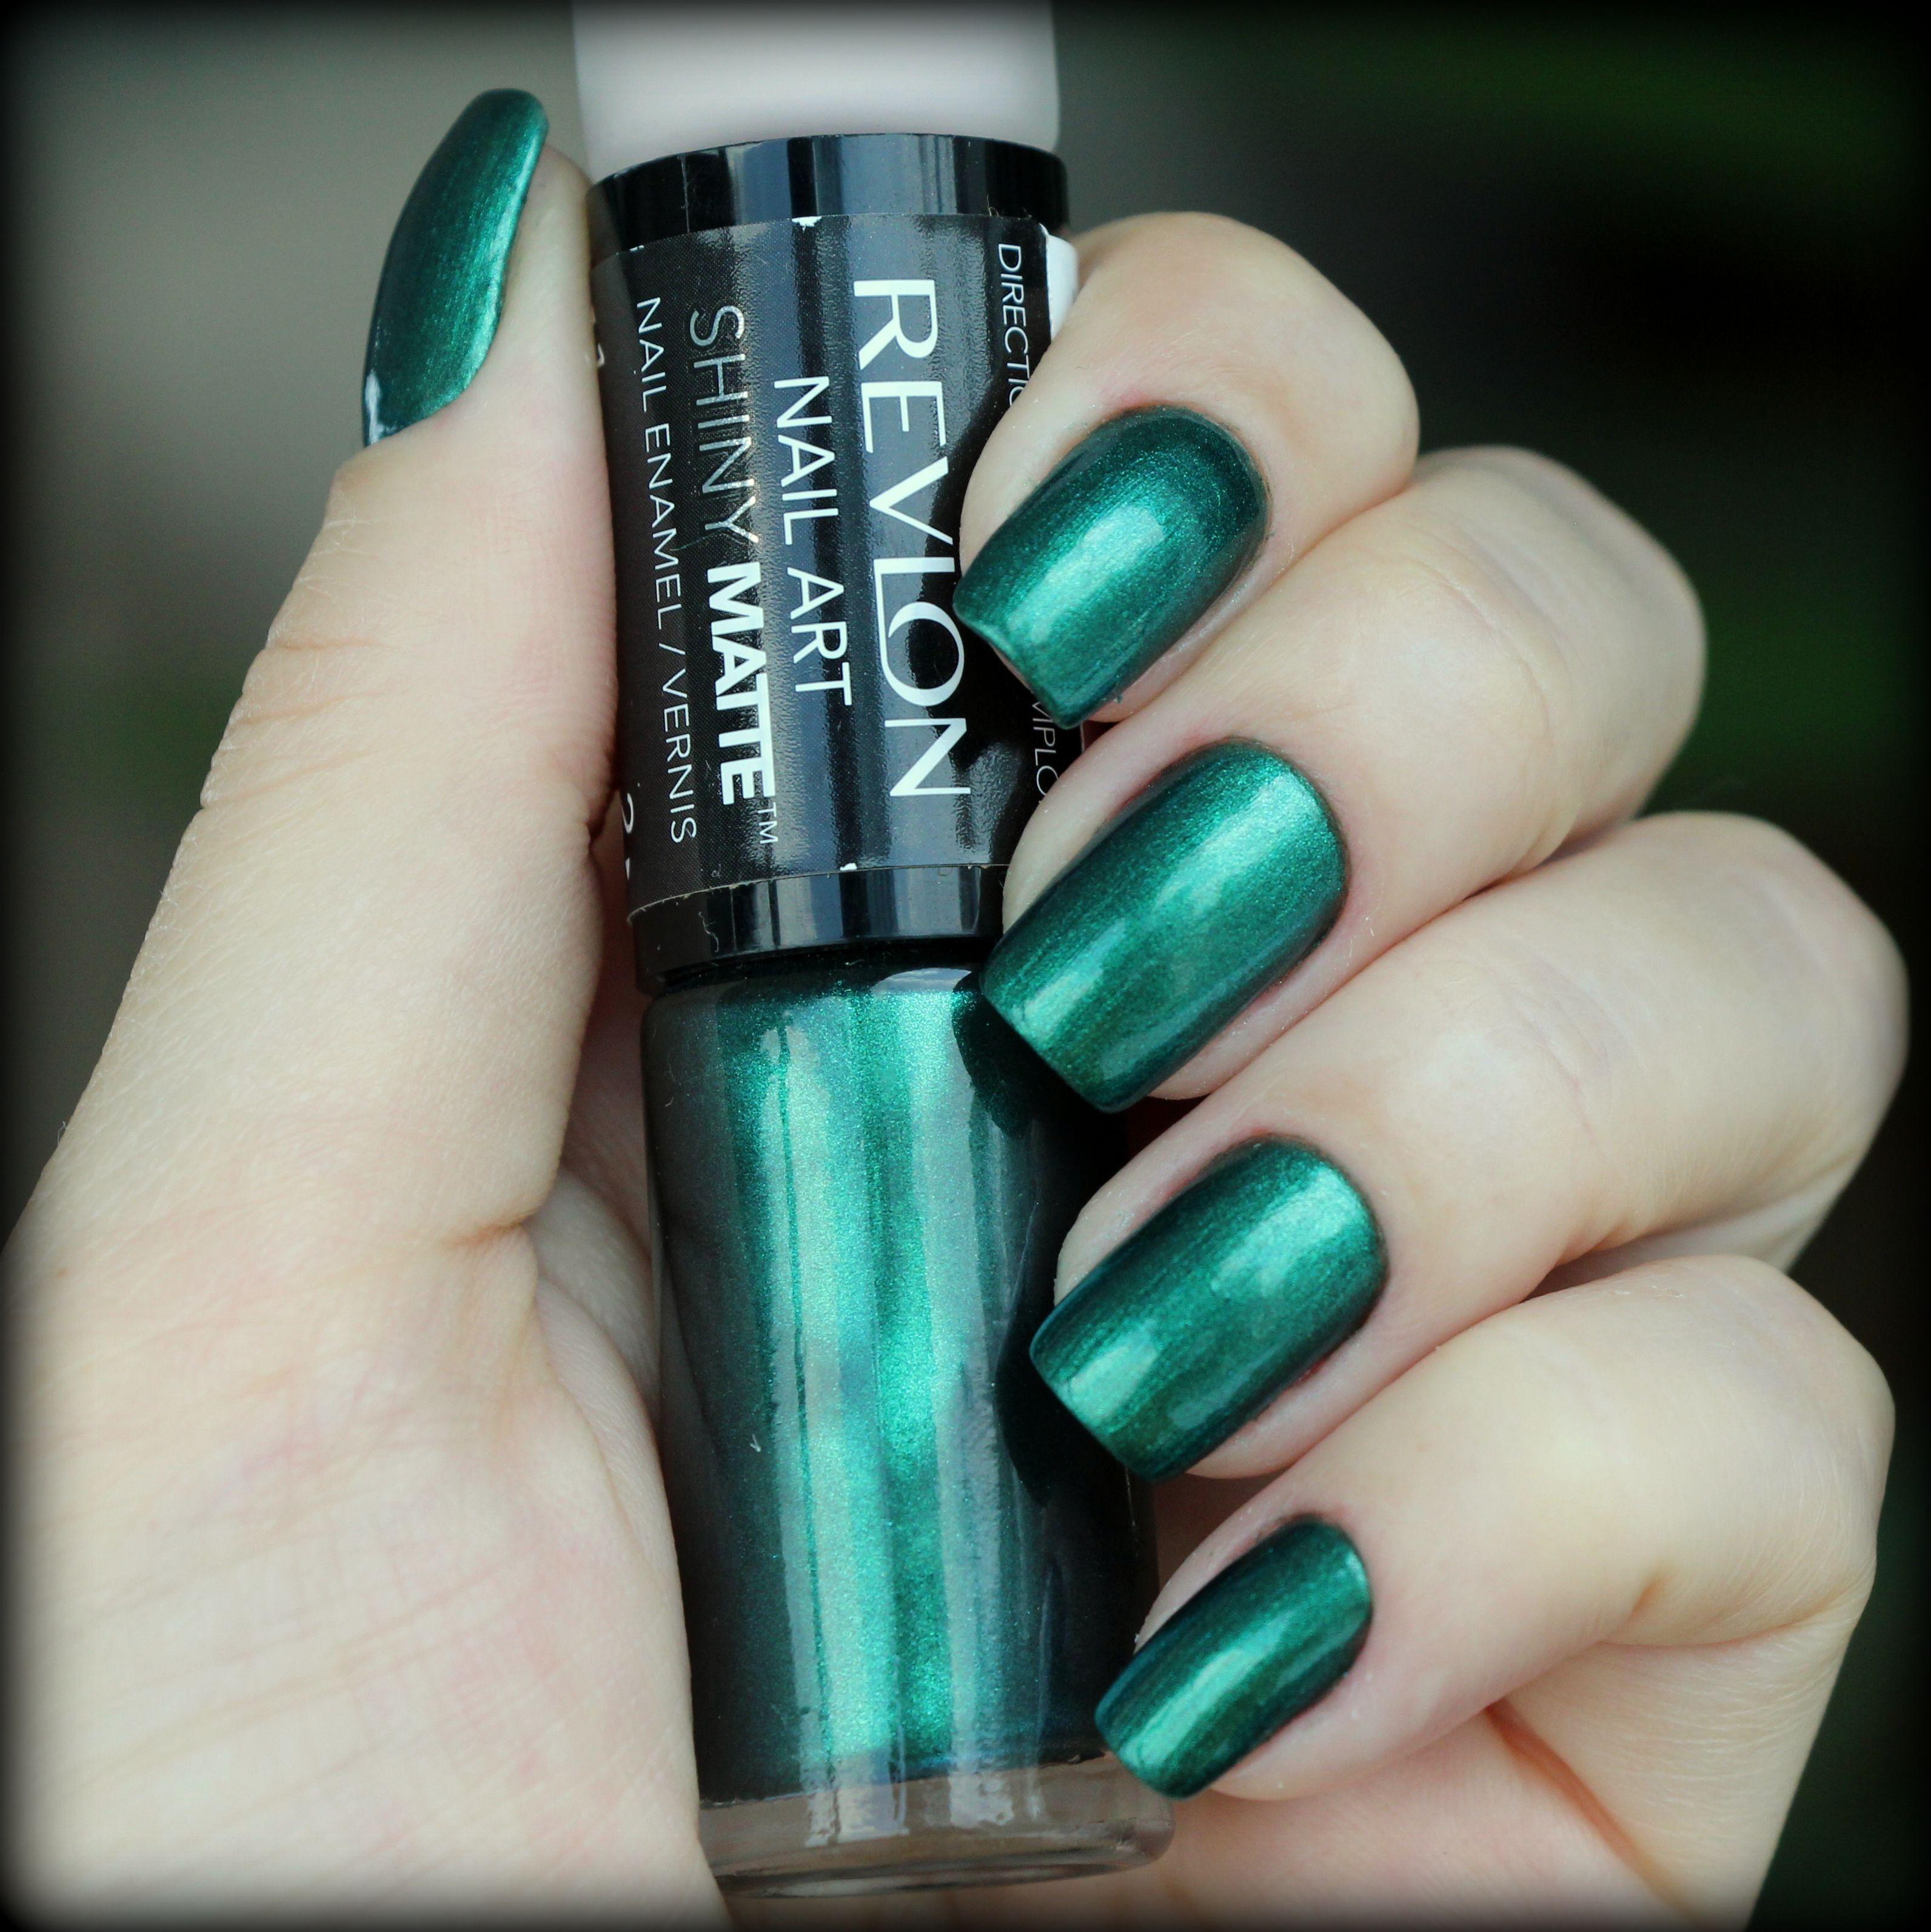 Revlon Nail Art Shinymatte In Emeraldsuede 479 Got Mine At